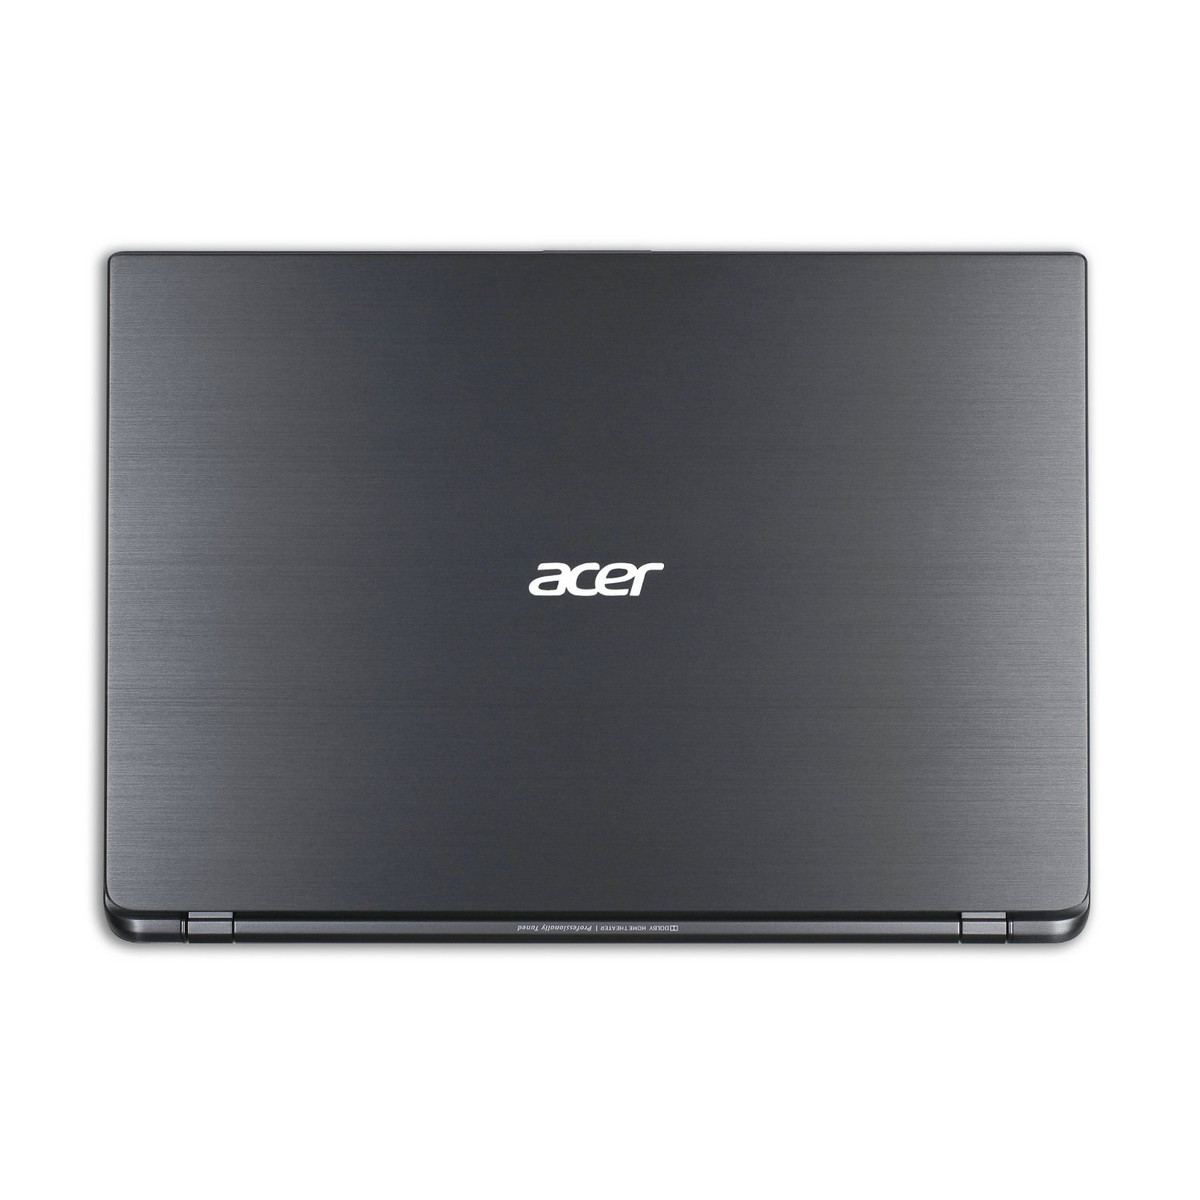 Acer Aspire M5-581T NVIDIA Graphics Vista